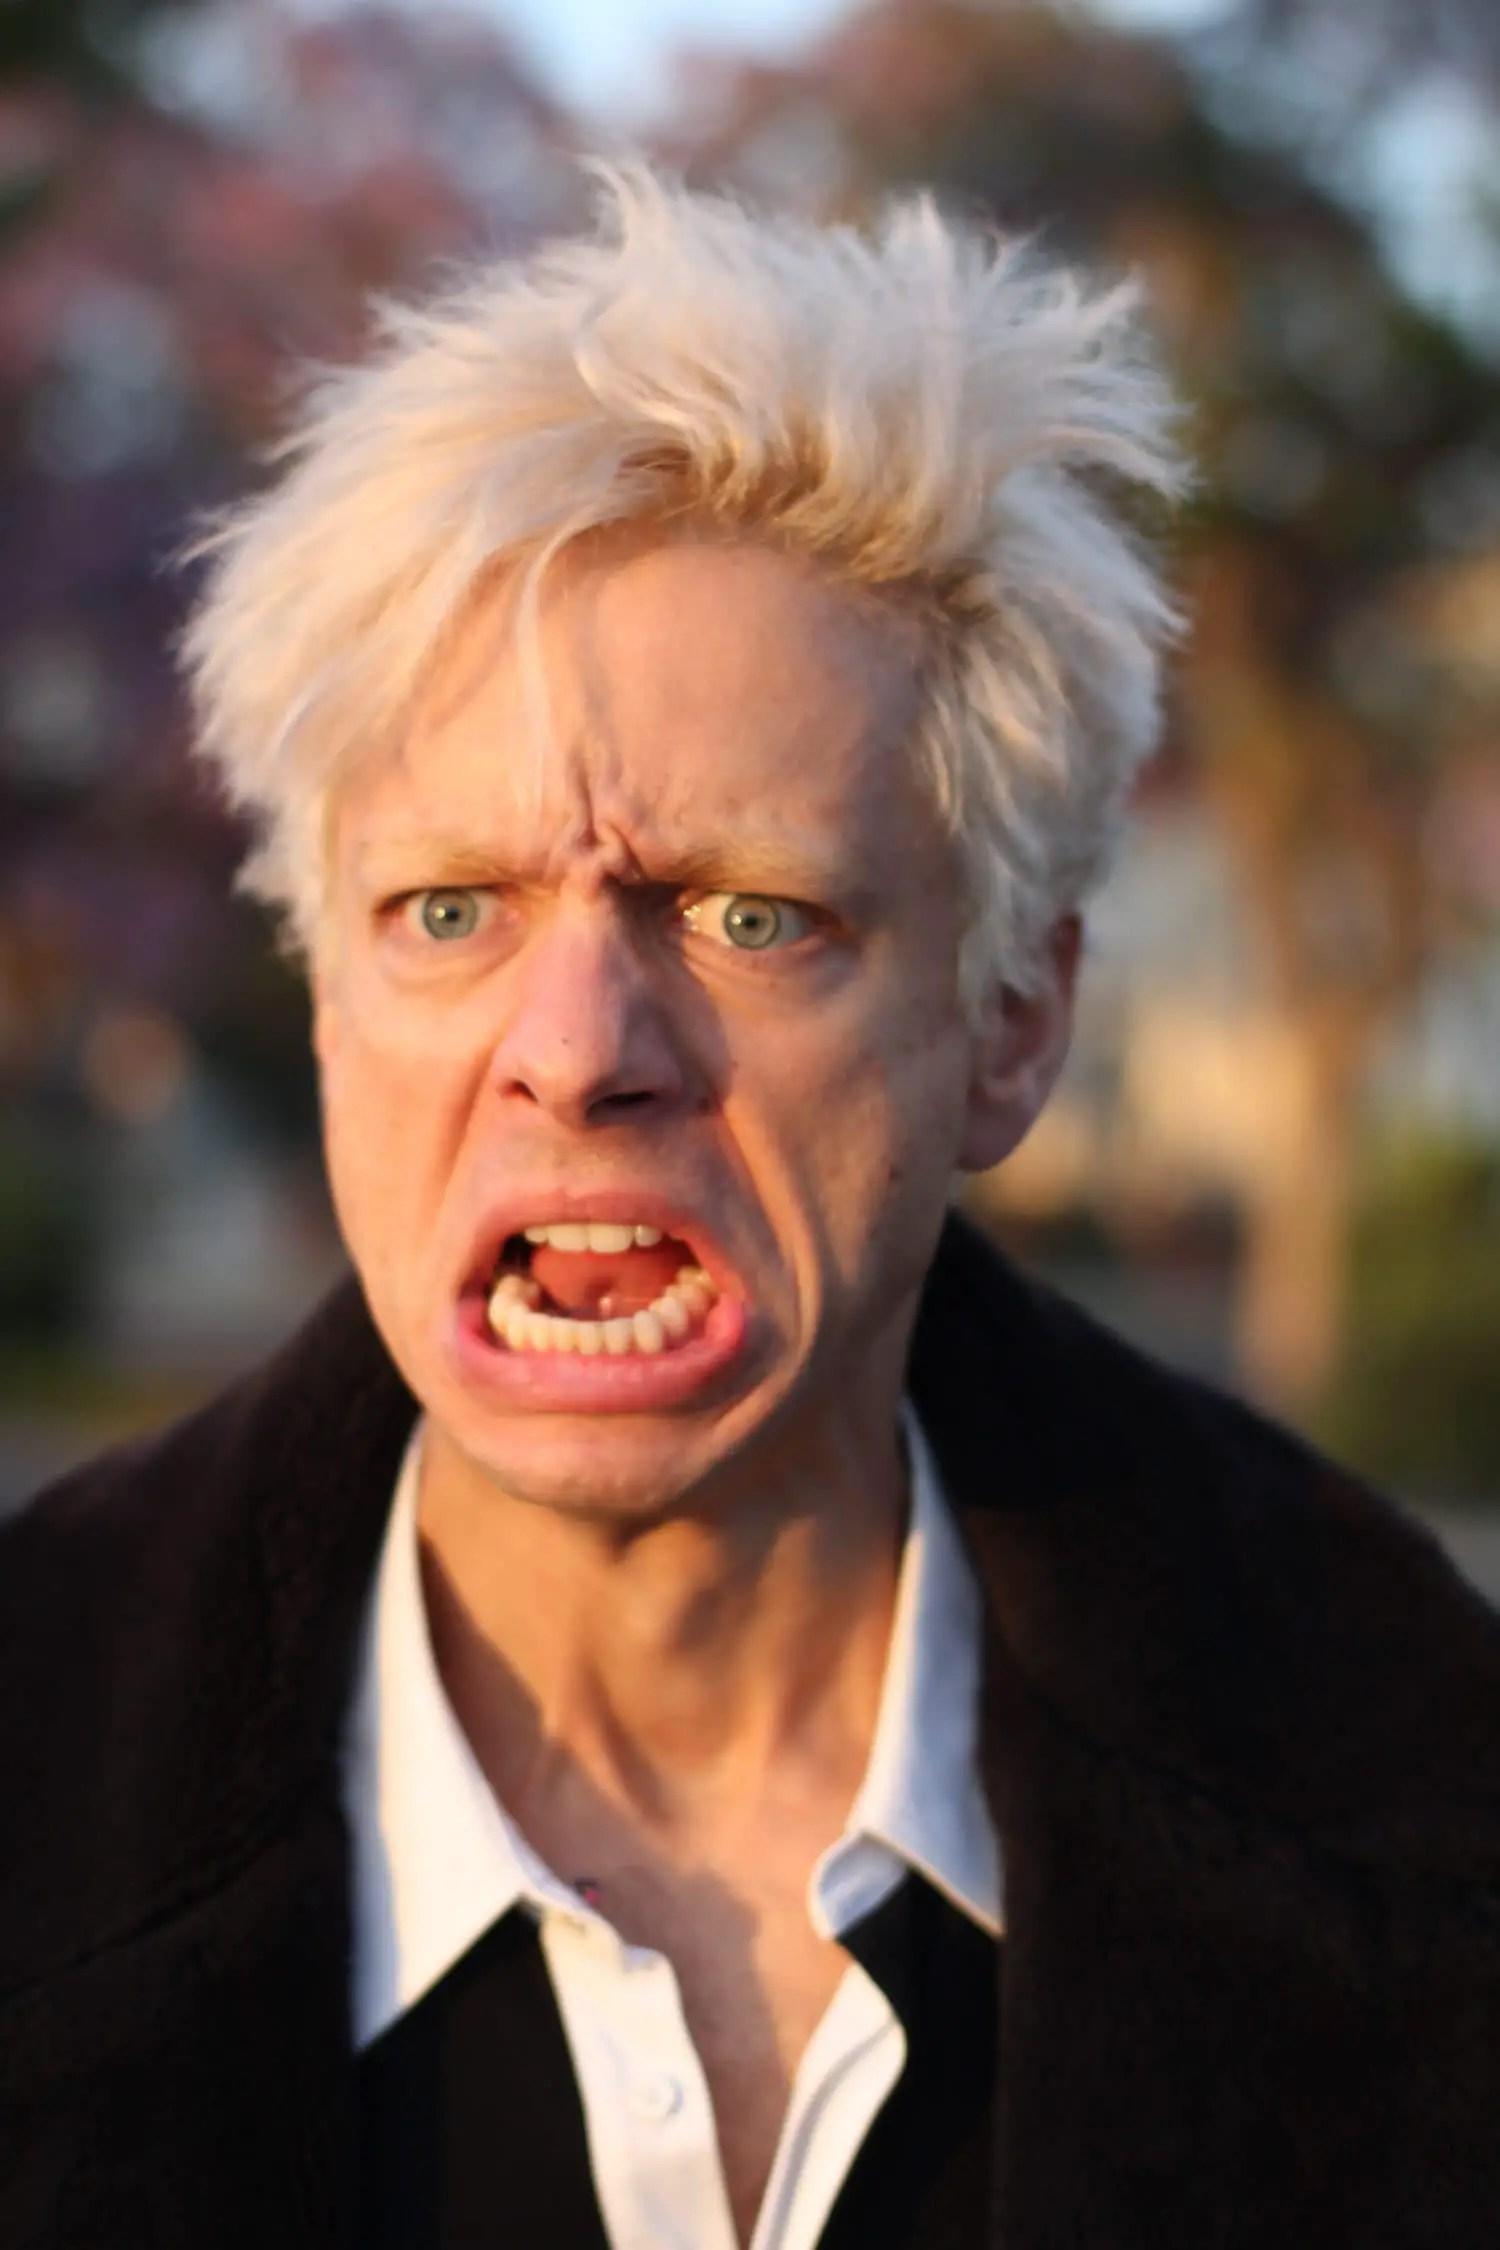 Klaus Kinski - Andrew Perez - The Second Coming - Fringe - Immersive Play - Art